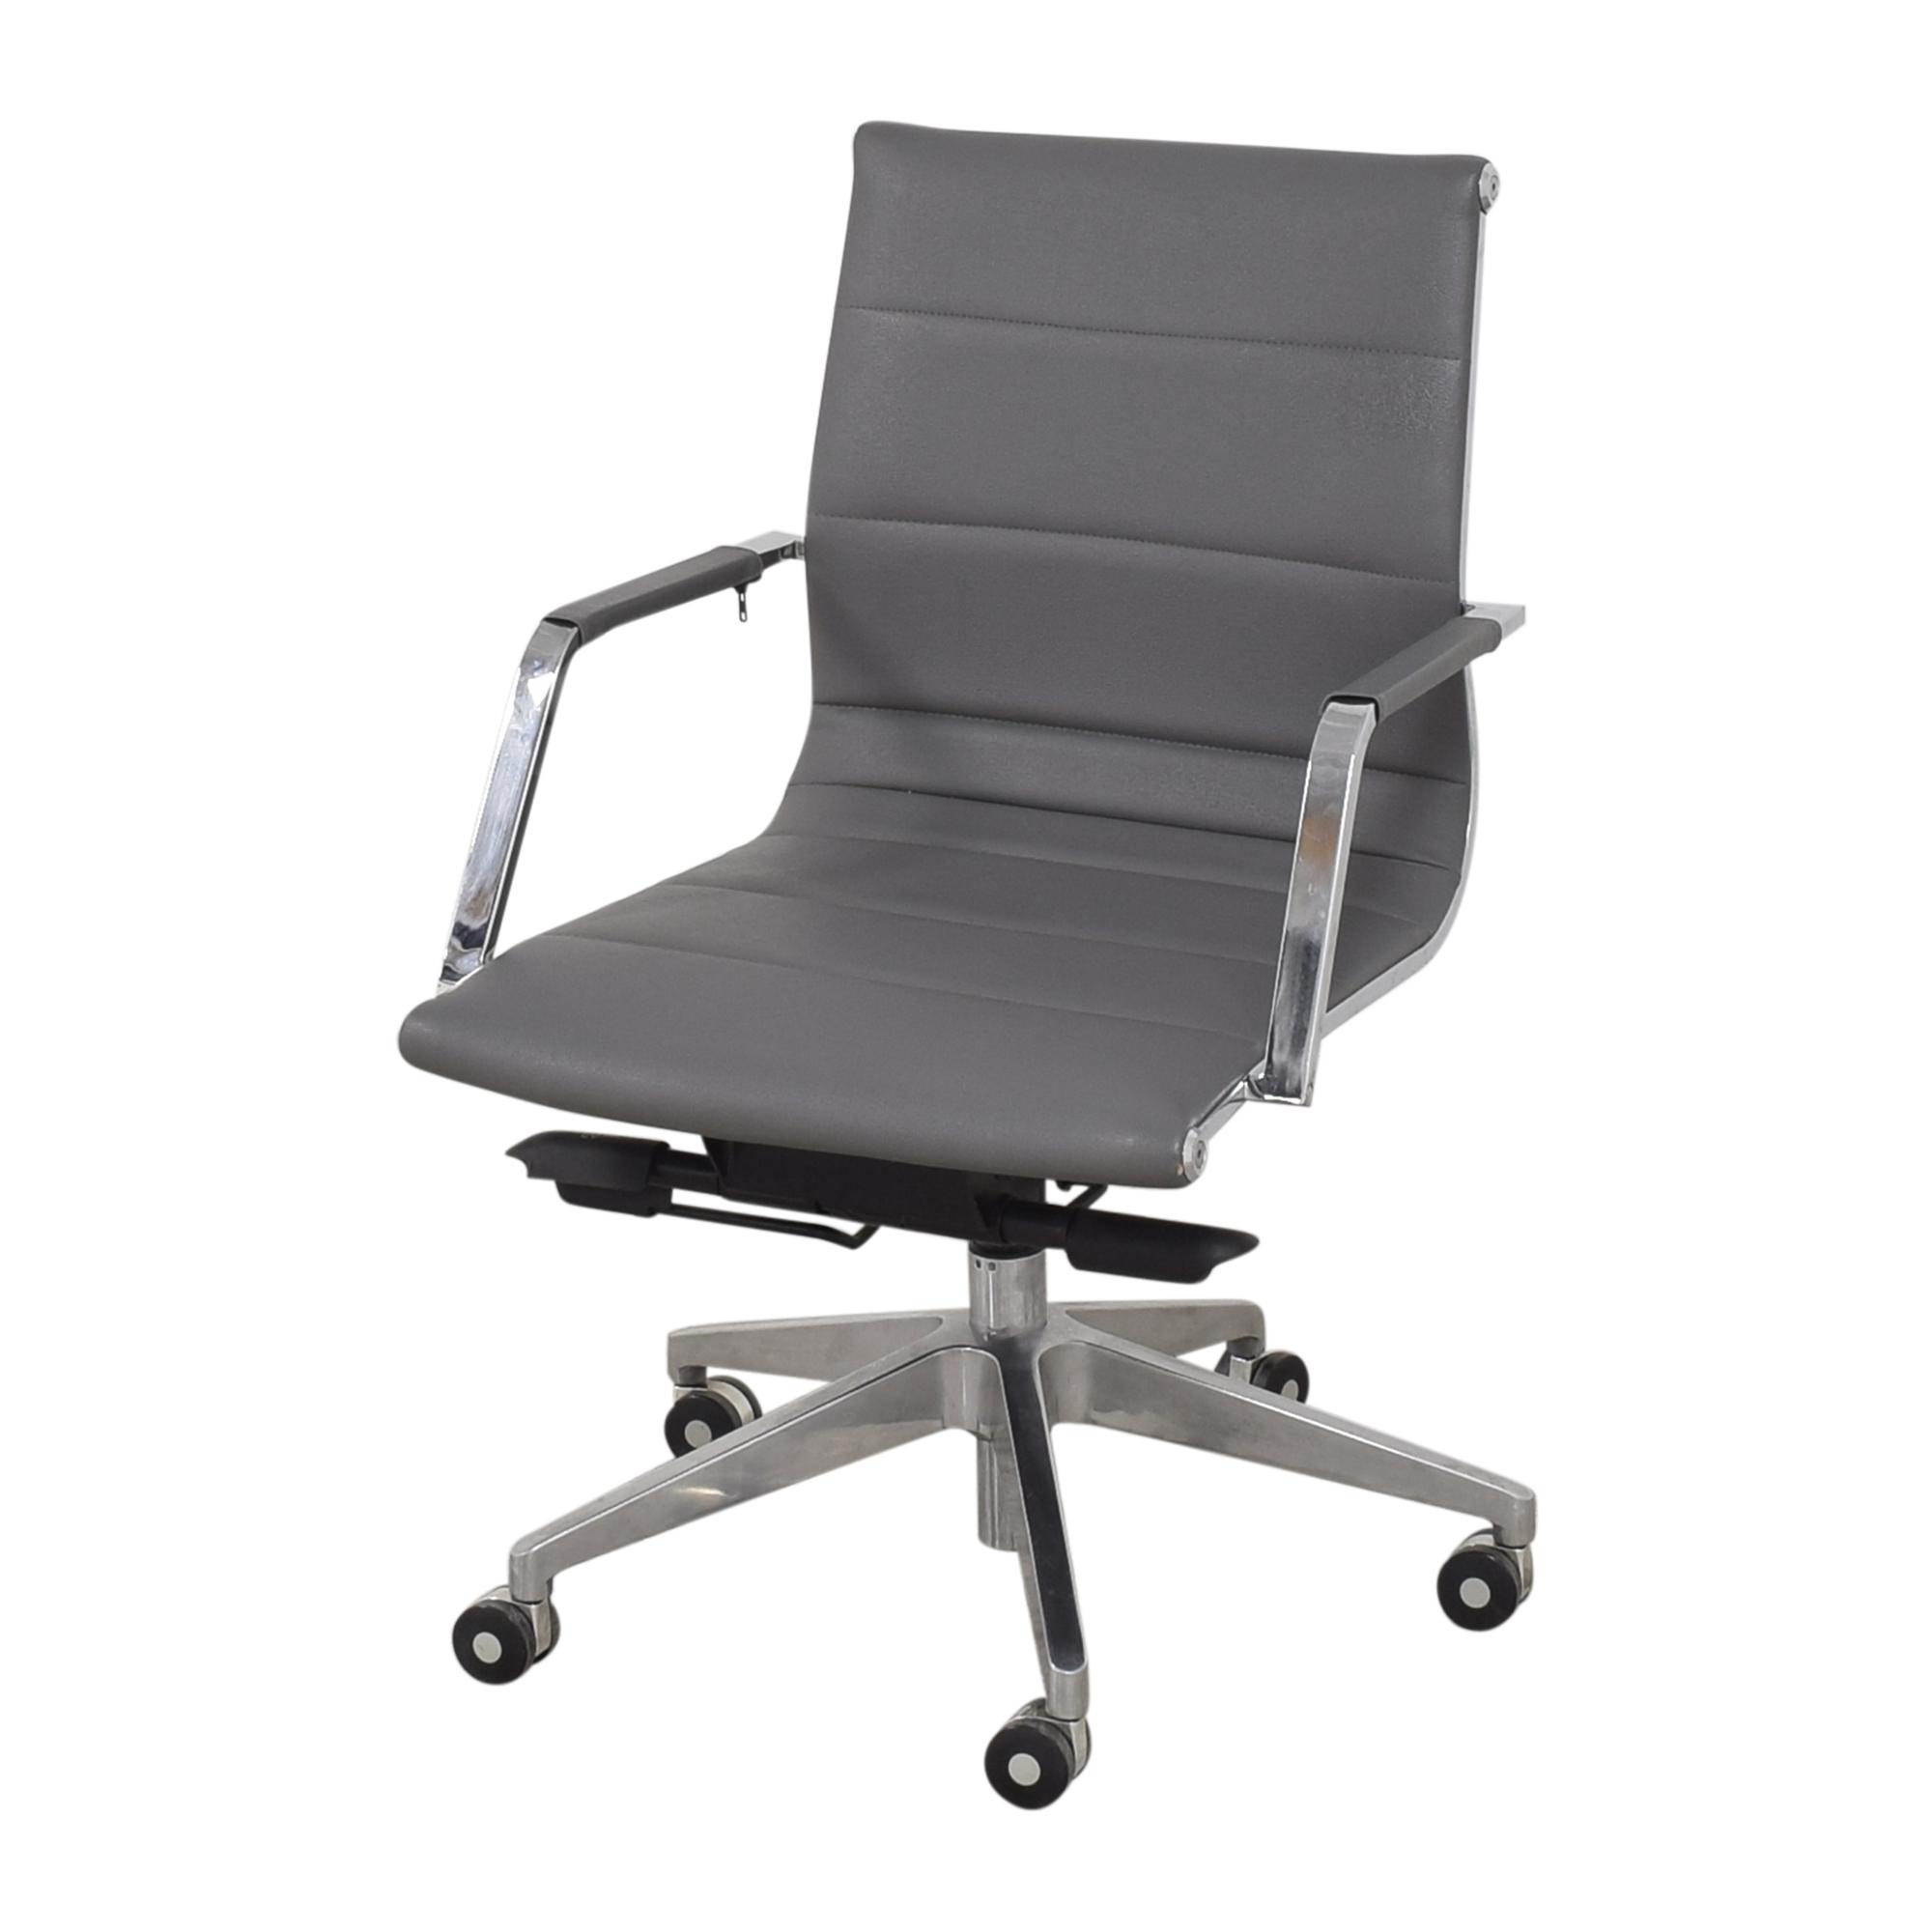 Jesper Office Jesper Office Adjustable Desk Chair discount